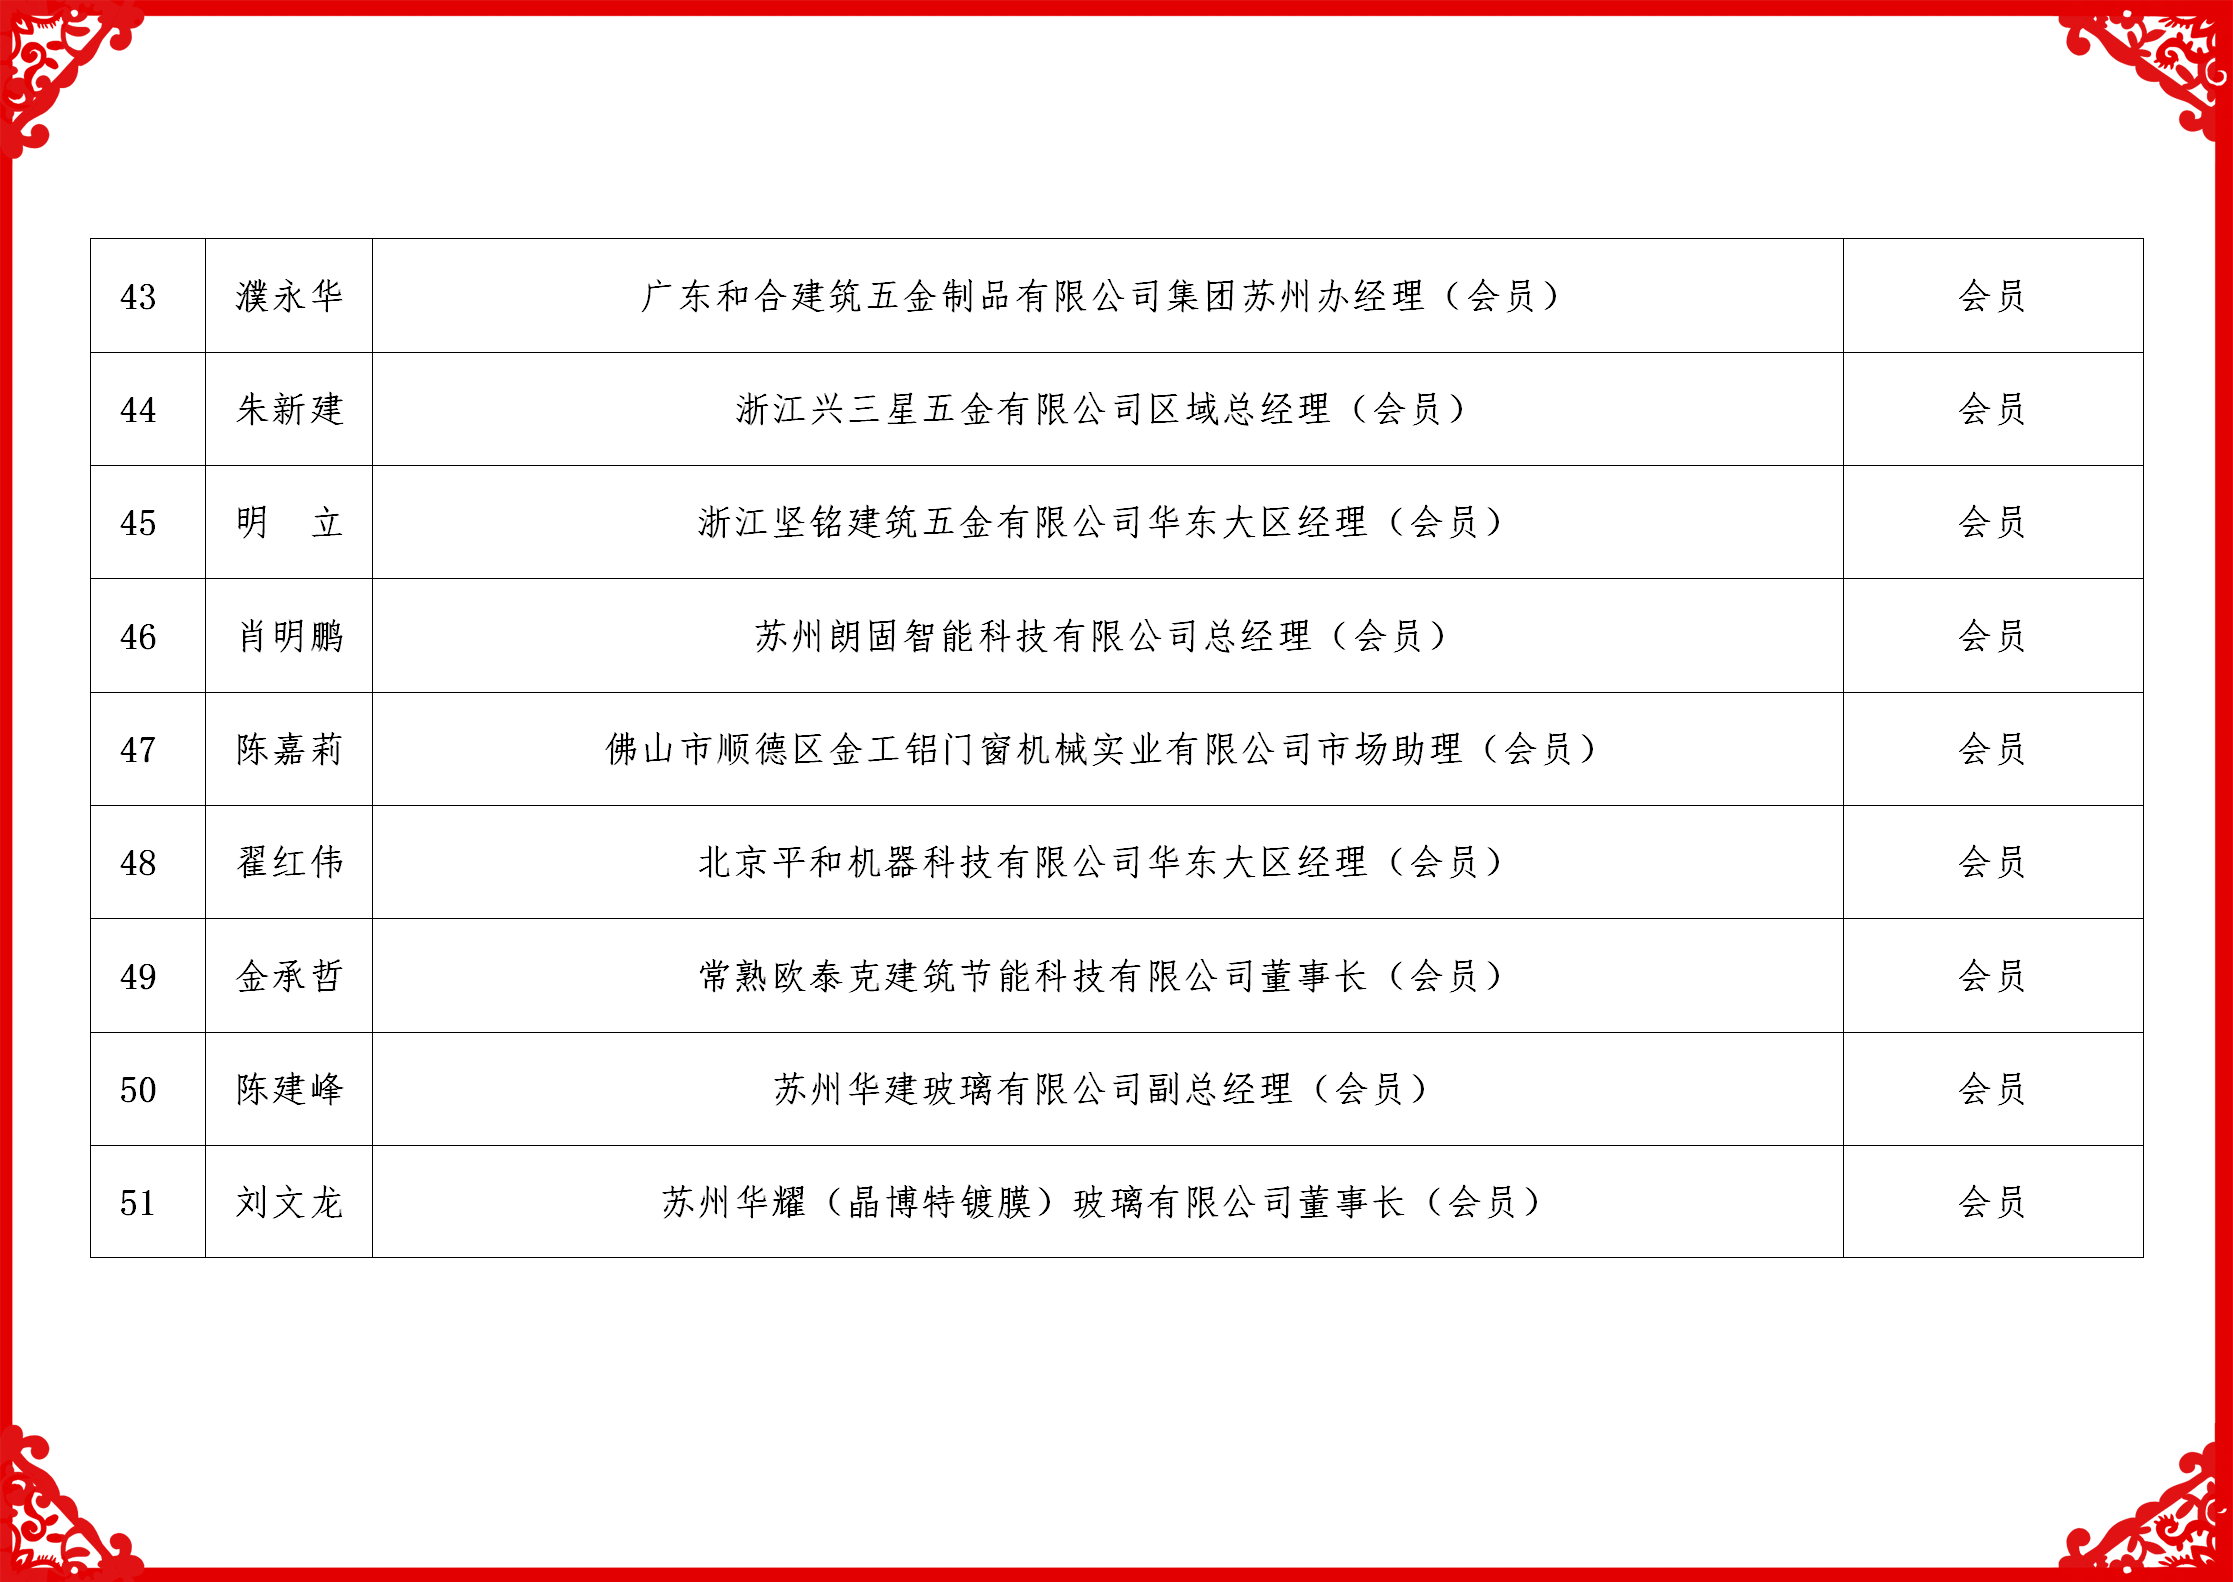 2019配套委名单_06